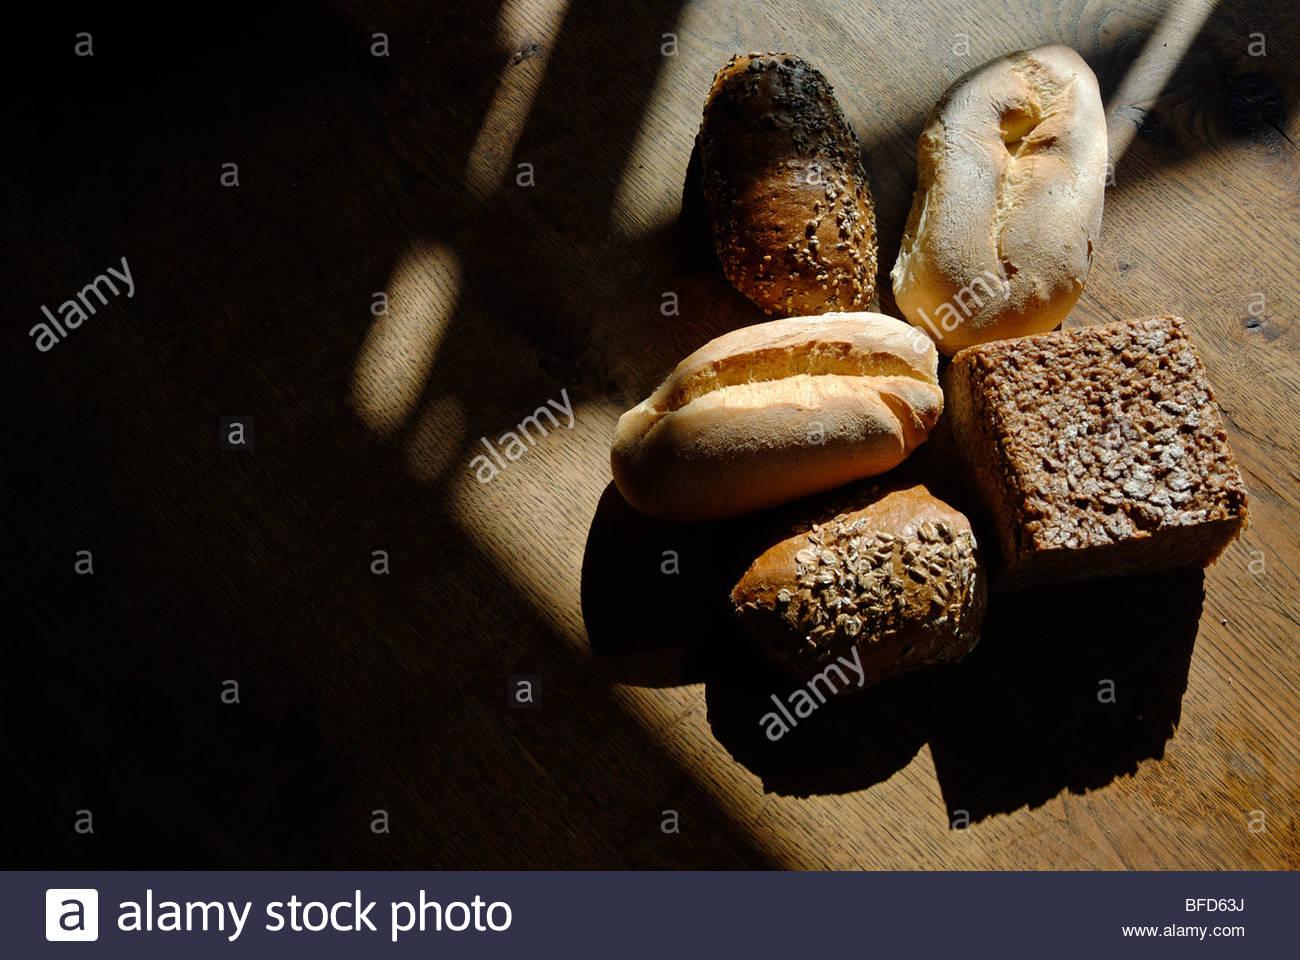 selection of German light and dark multigrain rye bread rolls - Stock Image